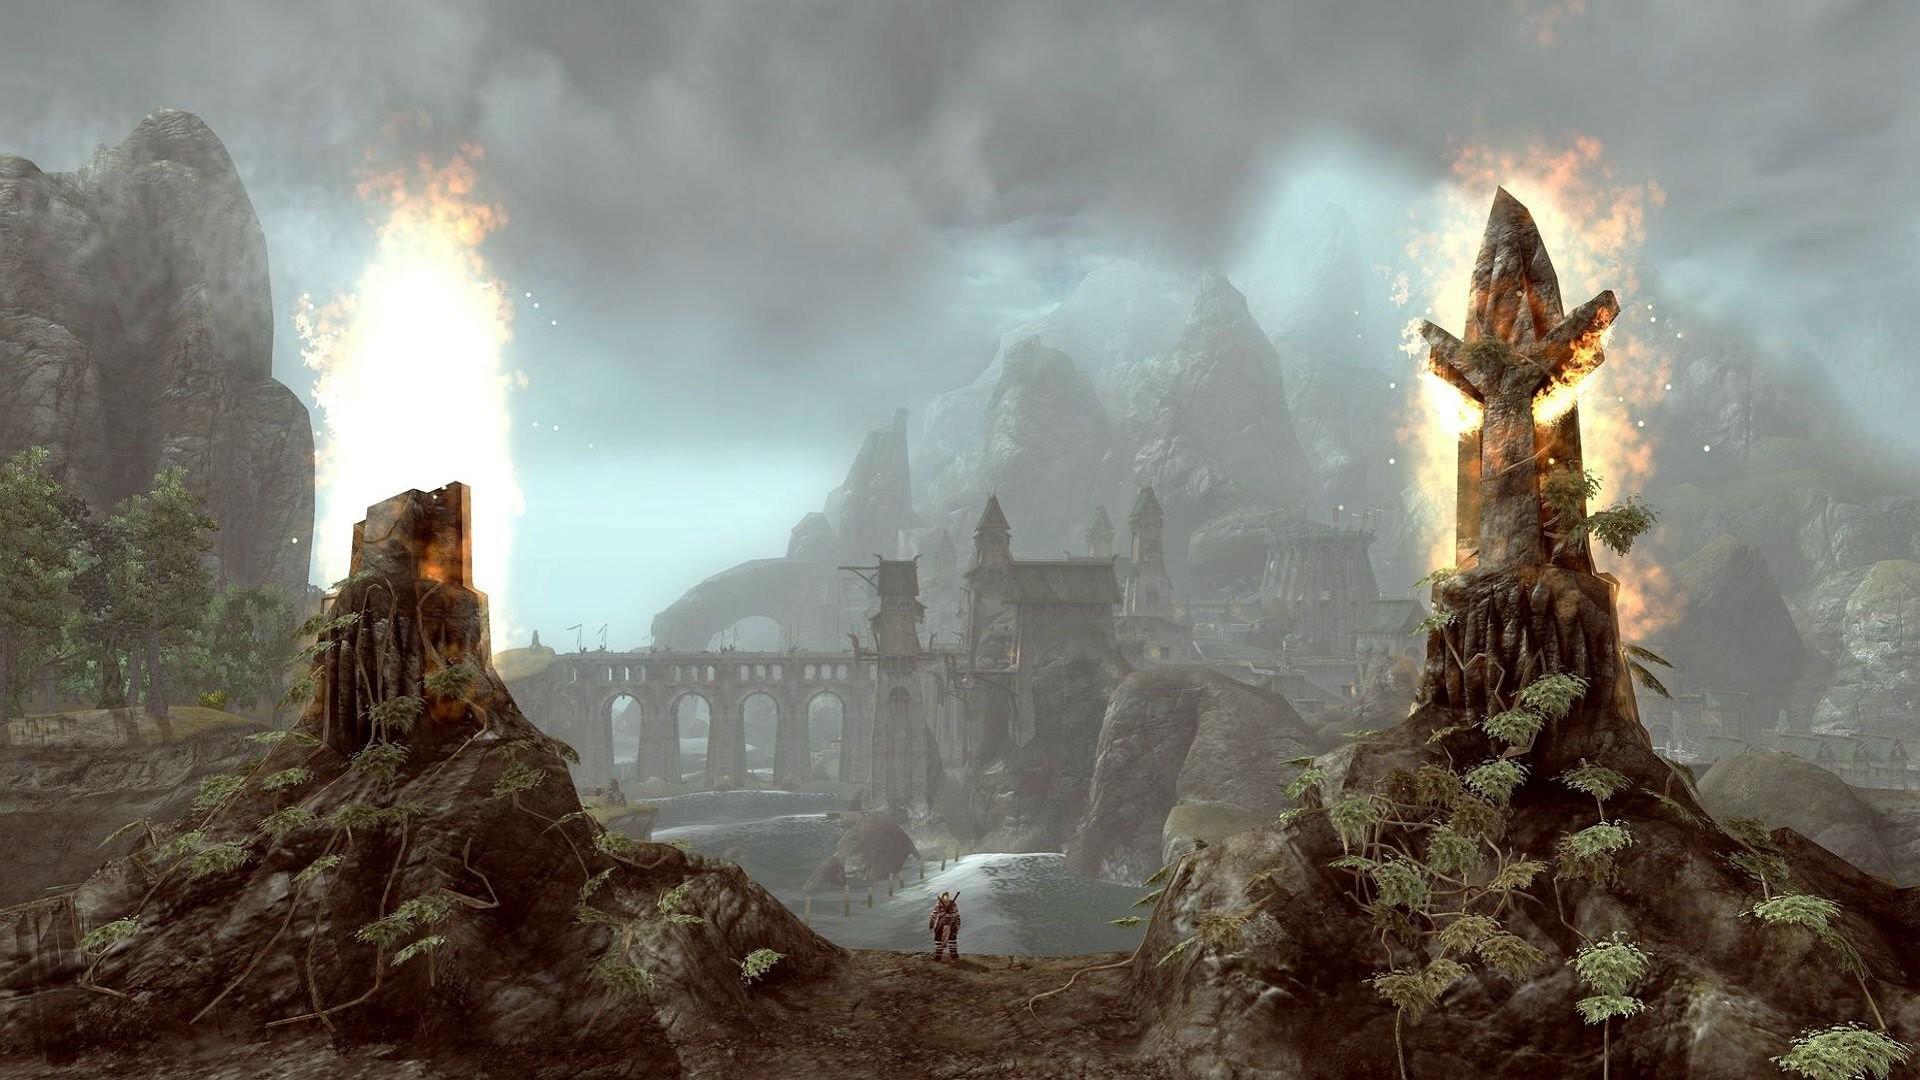 VIKING BATTLE ASGARD action adventure fighting sega 1vba norse exploration  mythological warrior wallpaper     630487   WallpaperUP